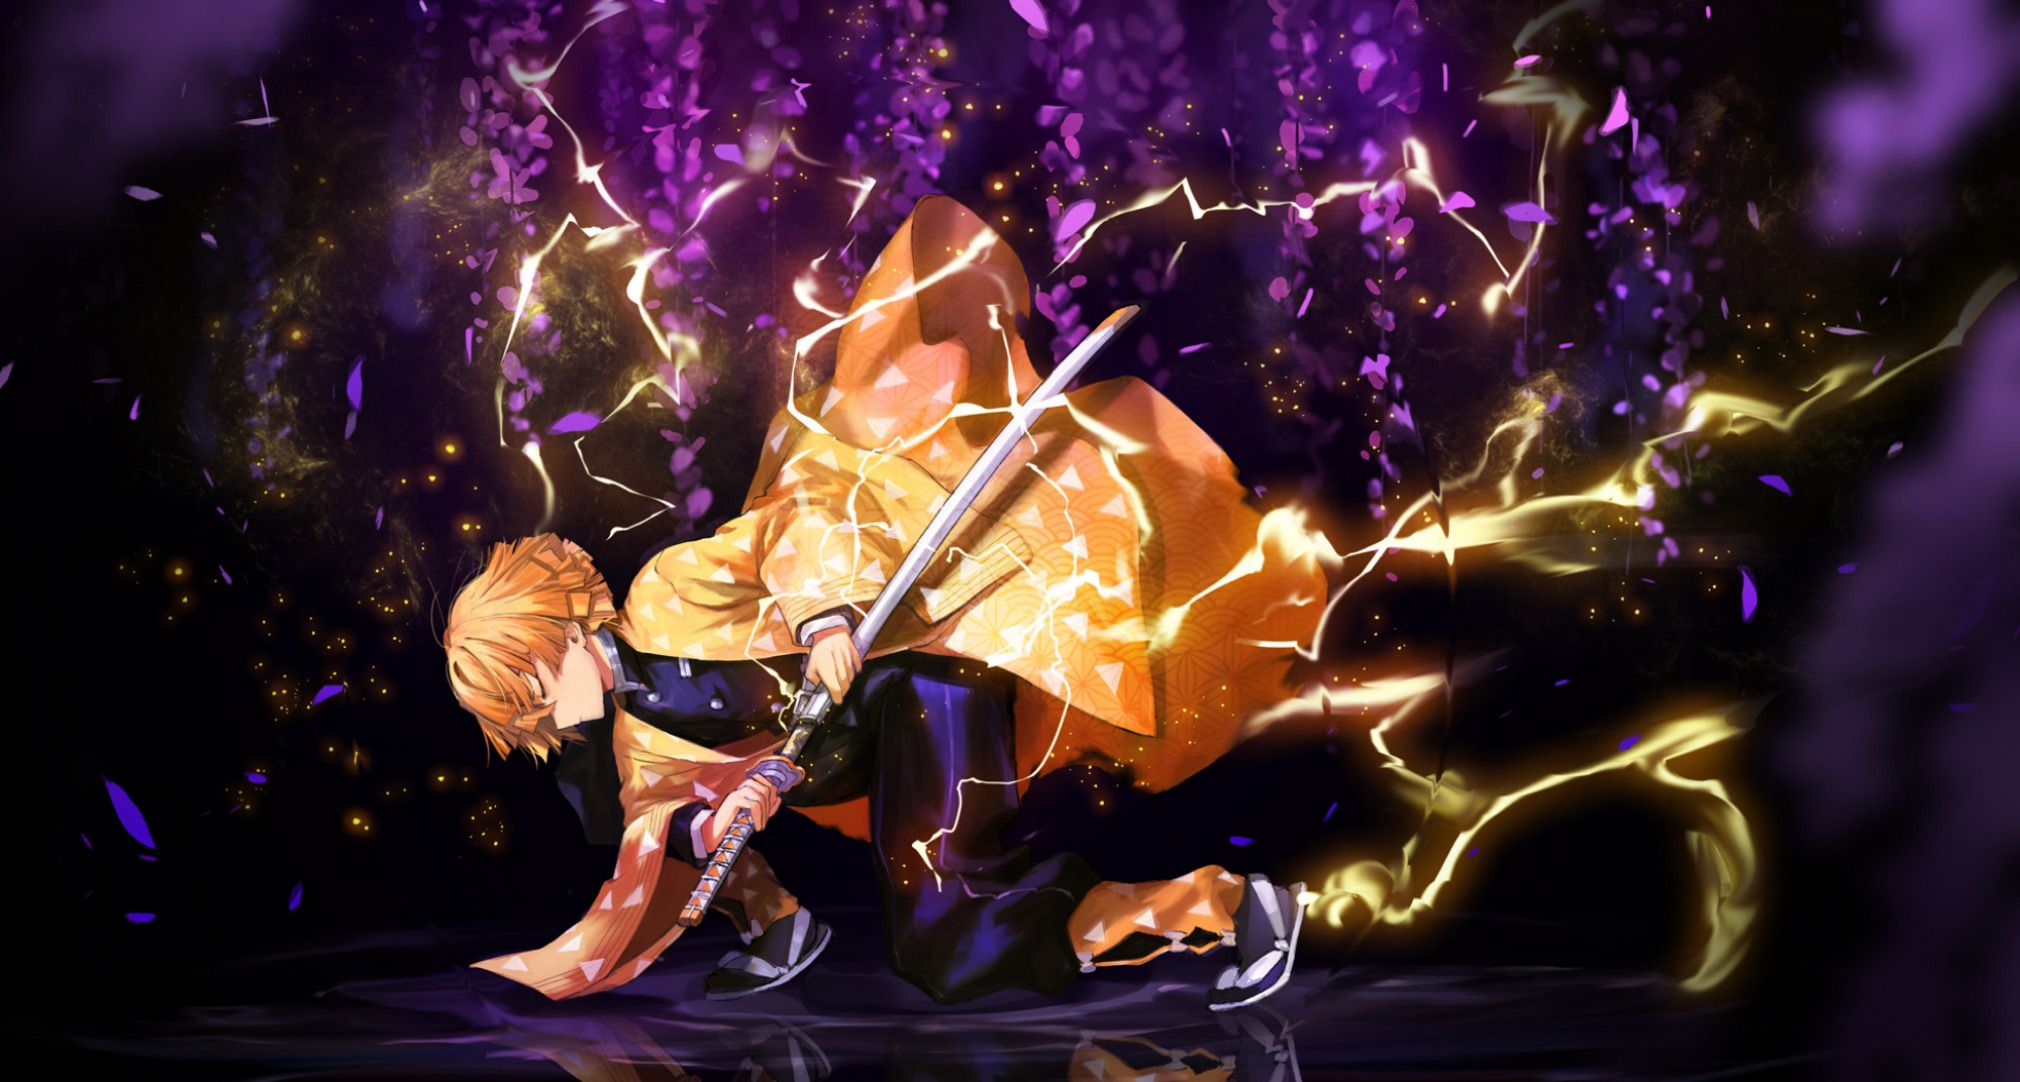 Wallpaper Naruto Dan Sasuke En 2020 Avec Images Naruto Manga